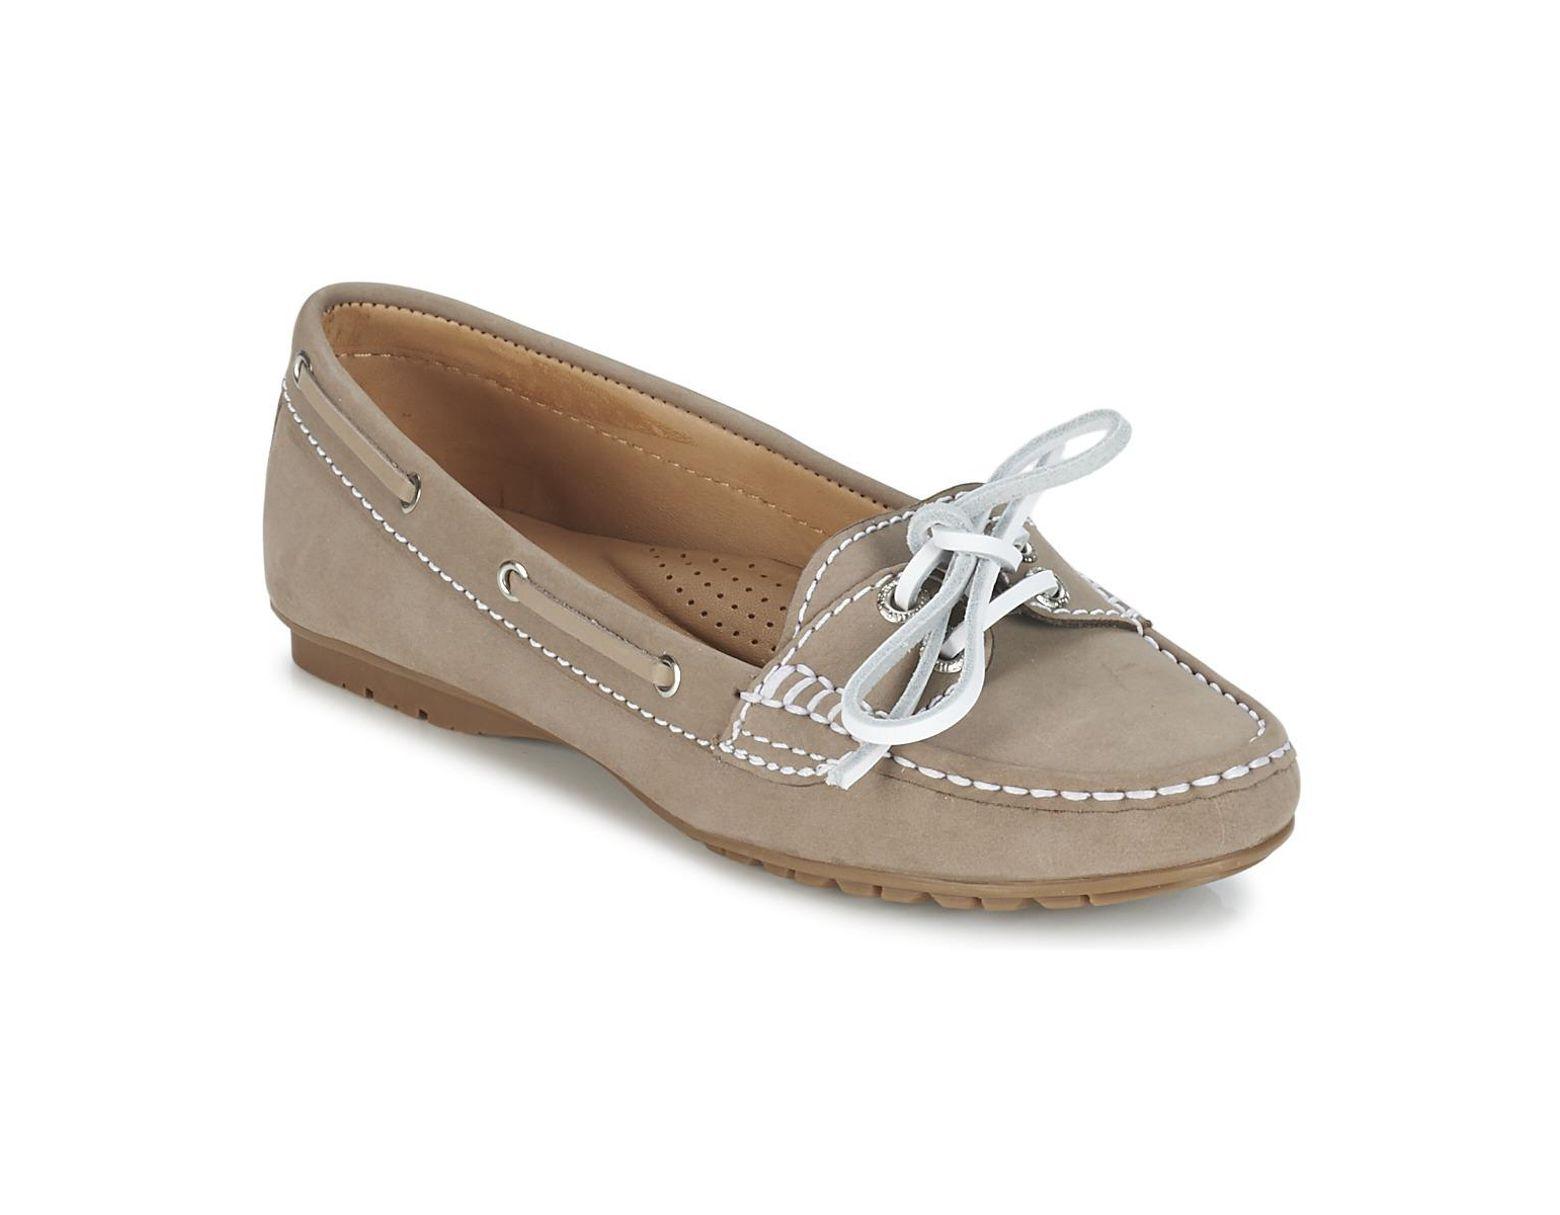 478392db36f99 Sebago Meriden Two Eye Women's Loafers / Casual Shoes In Beige in Natural -  Lyst